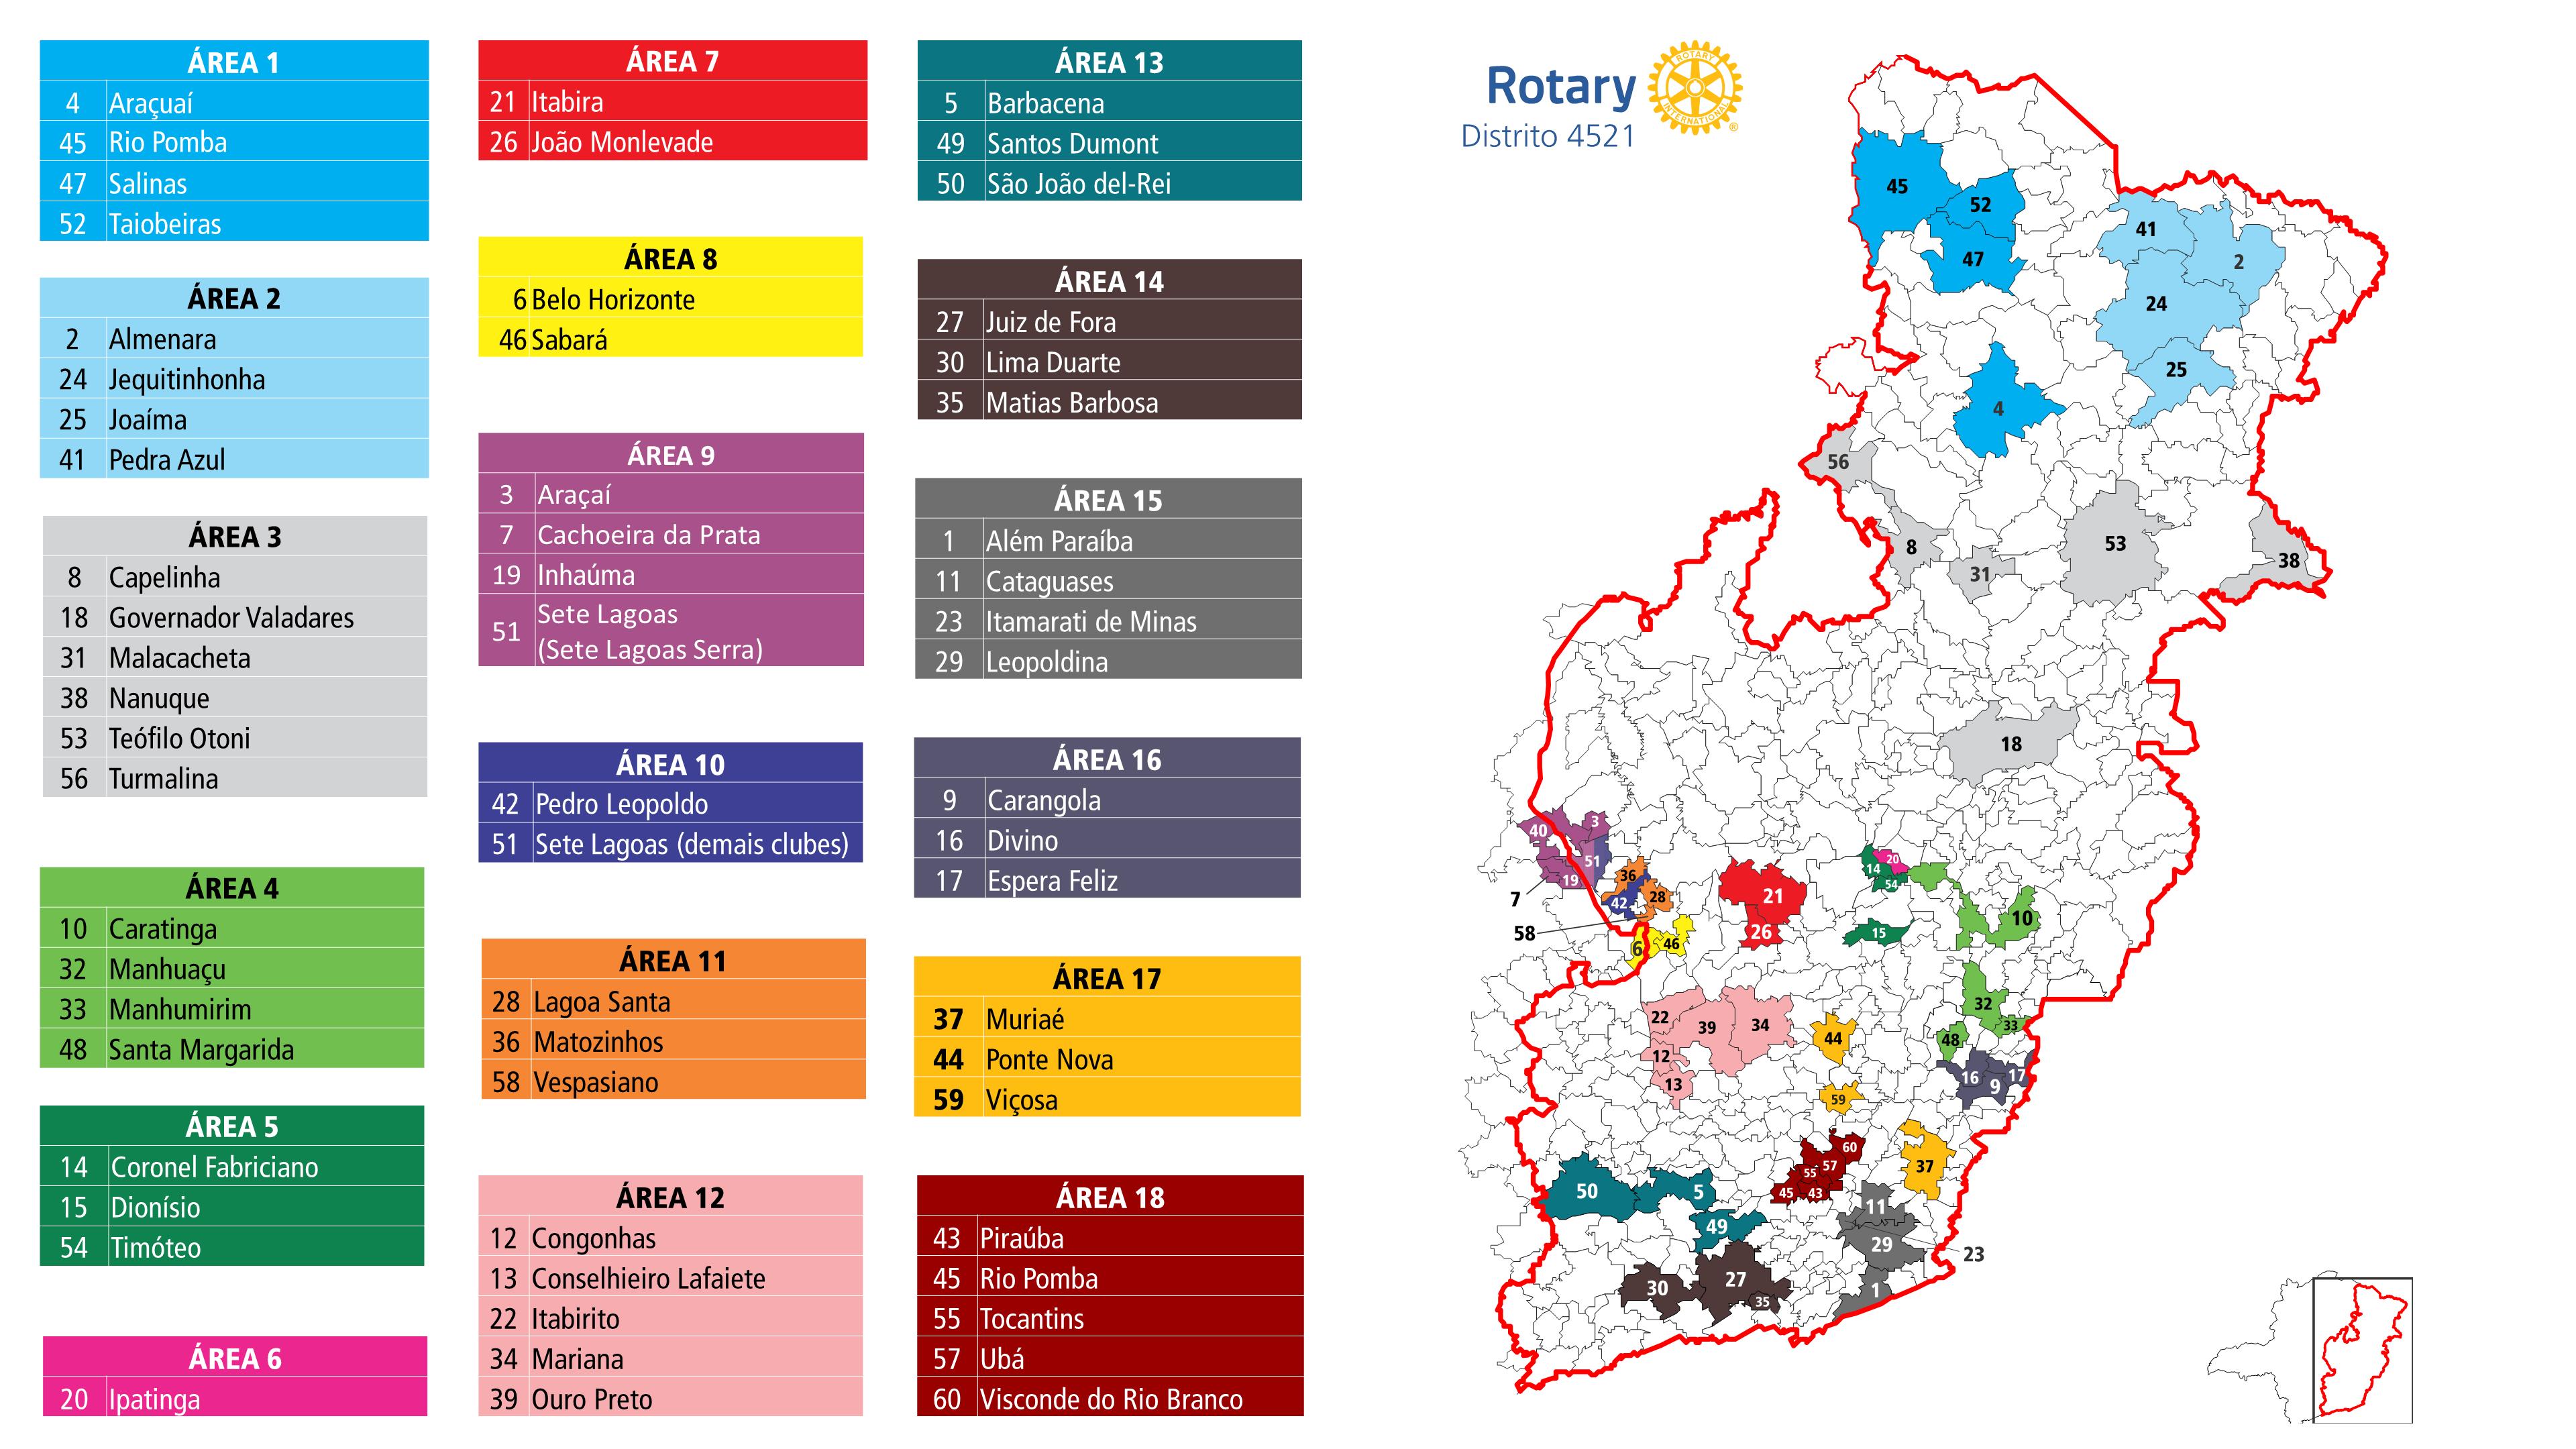 Mapa do Distrito 4521 dividido por áreas